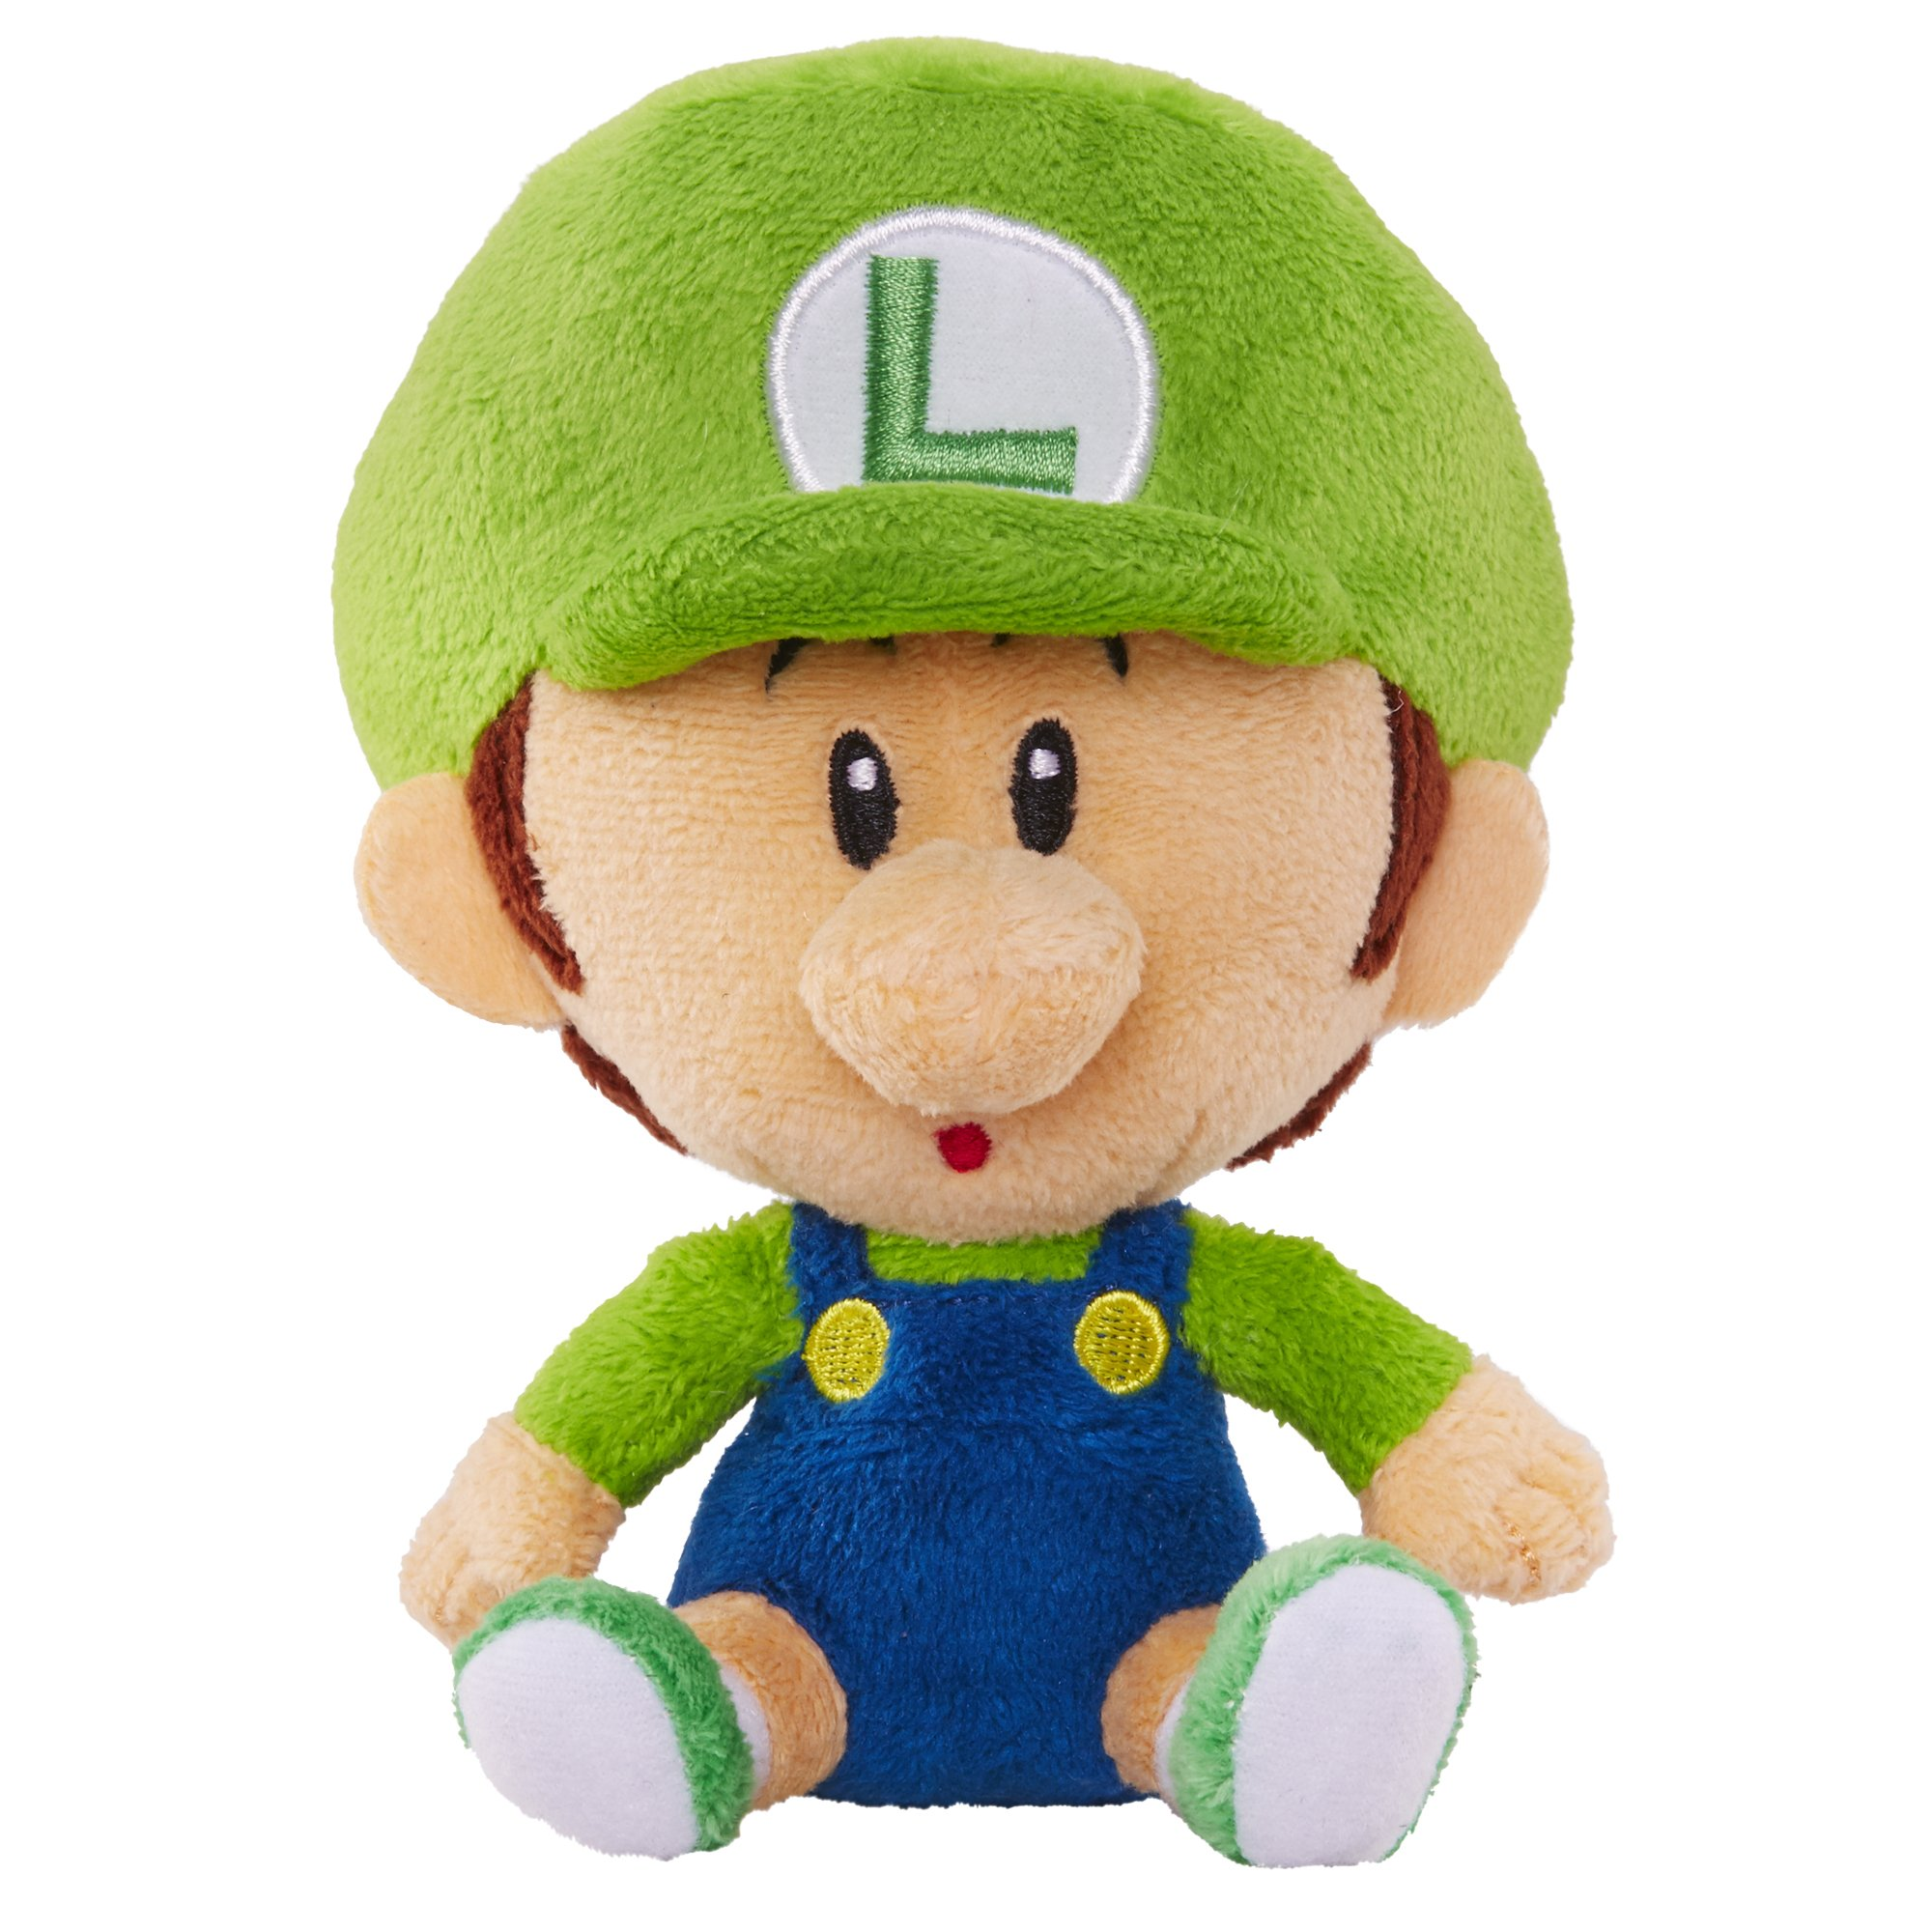 World of Nintendo Mario Bros U Baby Luigi Plush | eBay